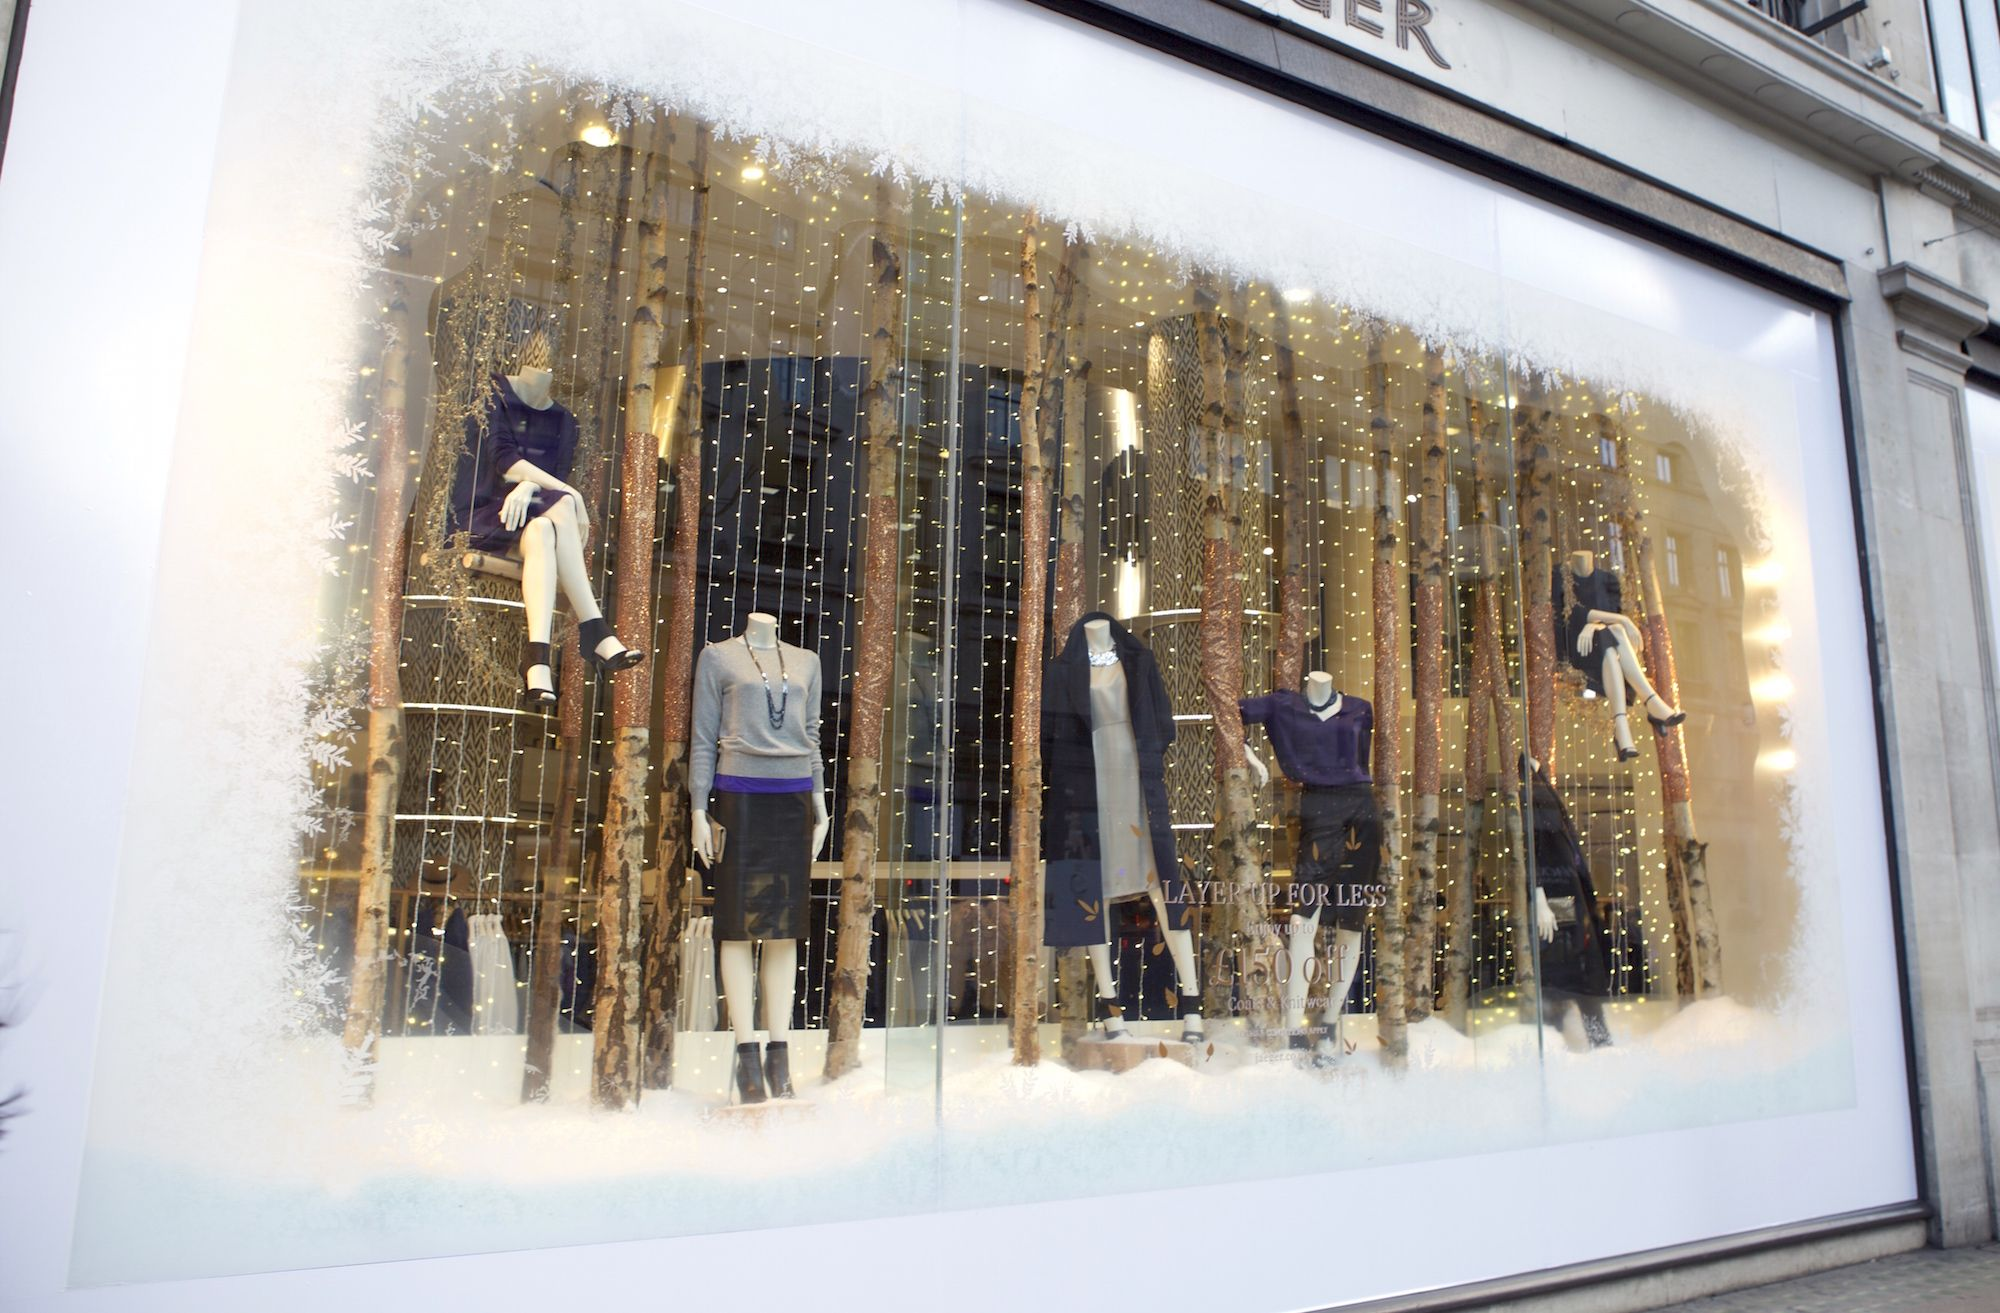 @jaegerofficial on #RegentStreet have got their #Christmas wardrobe ready.